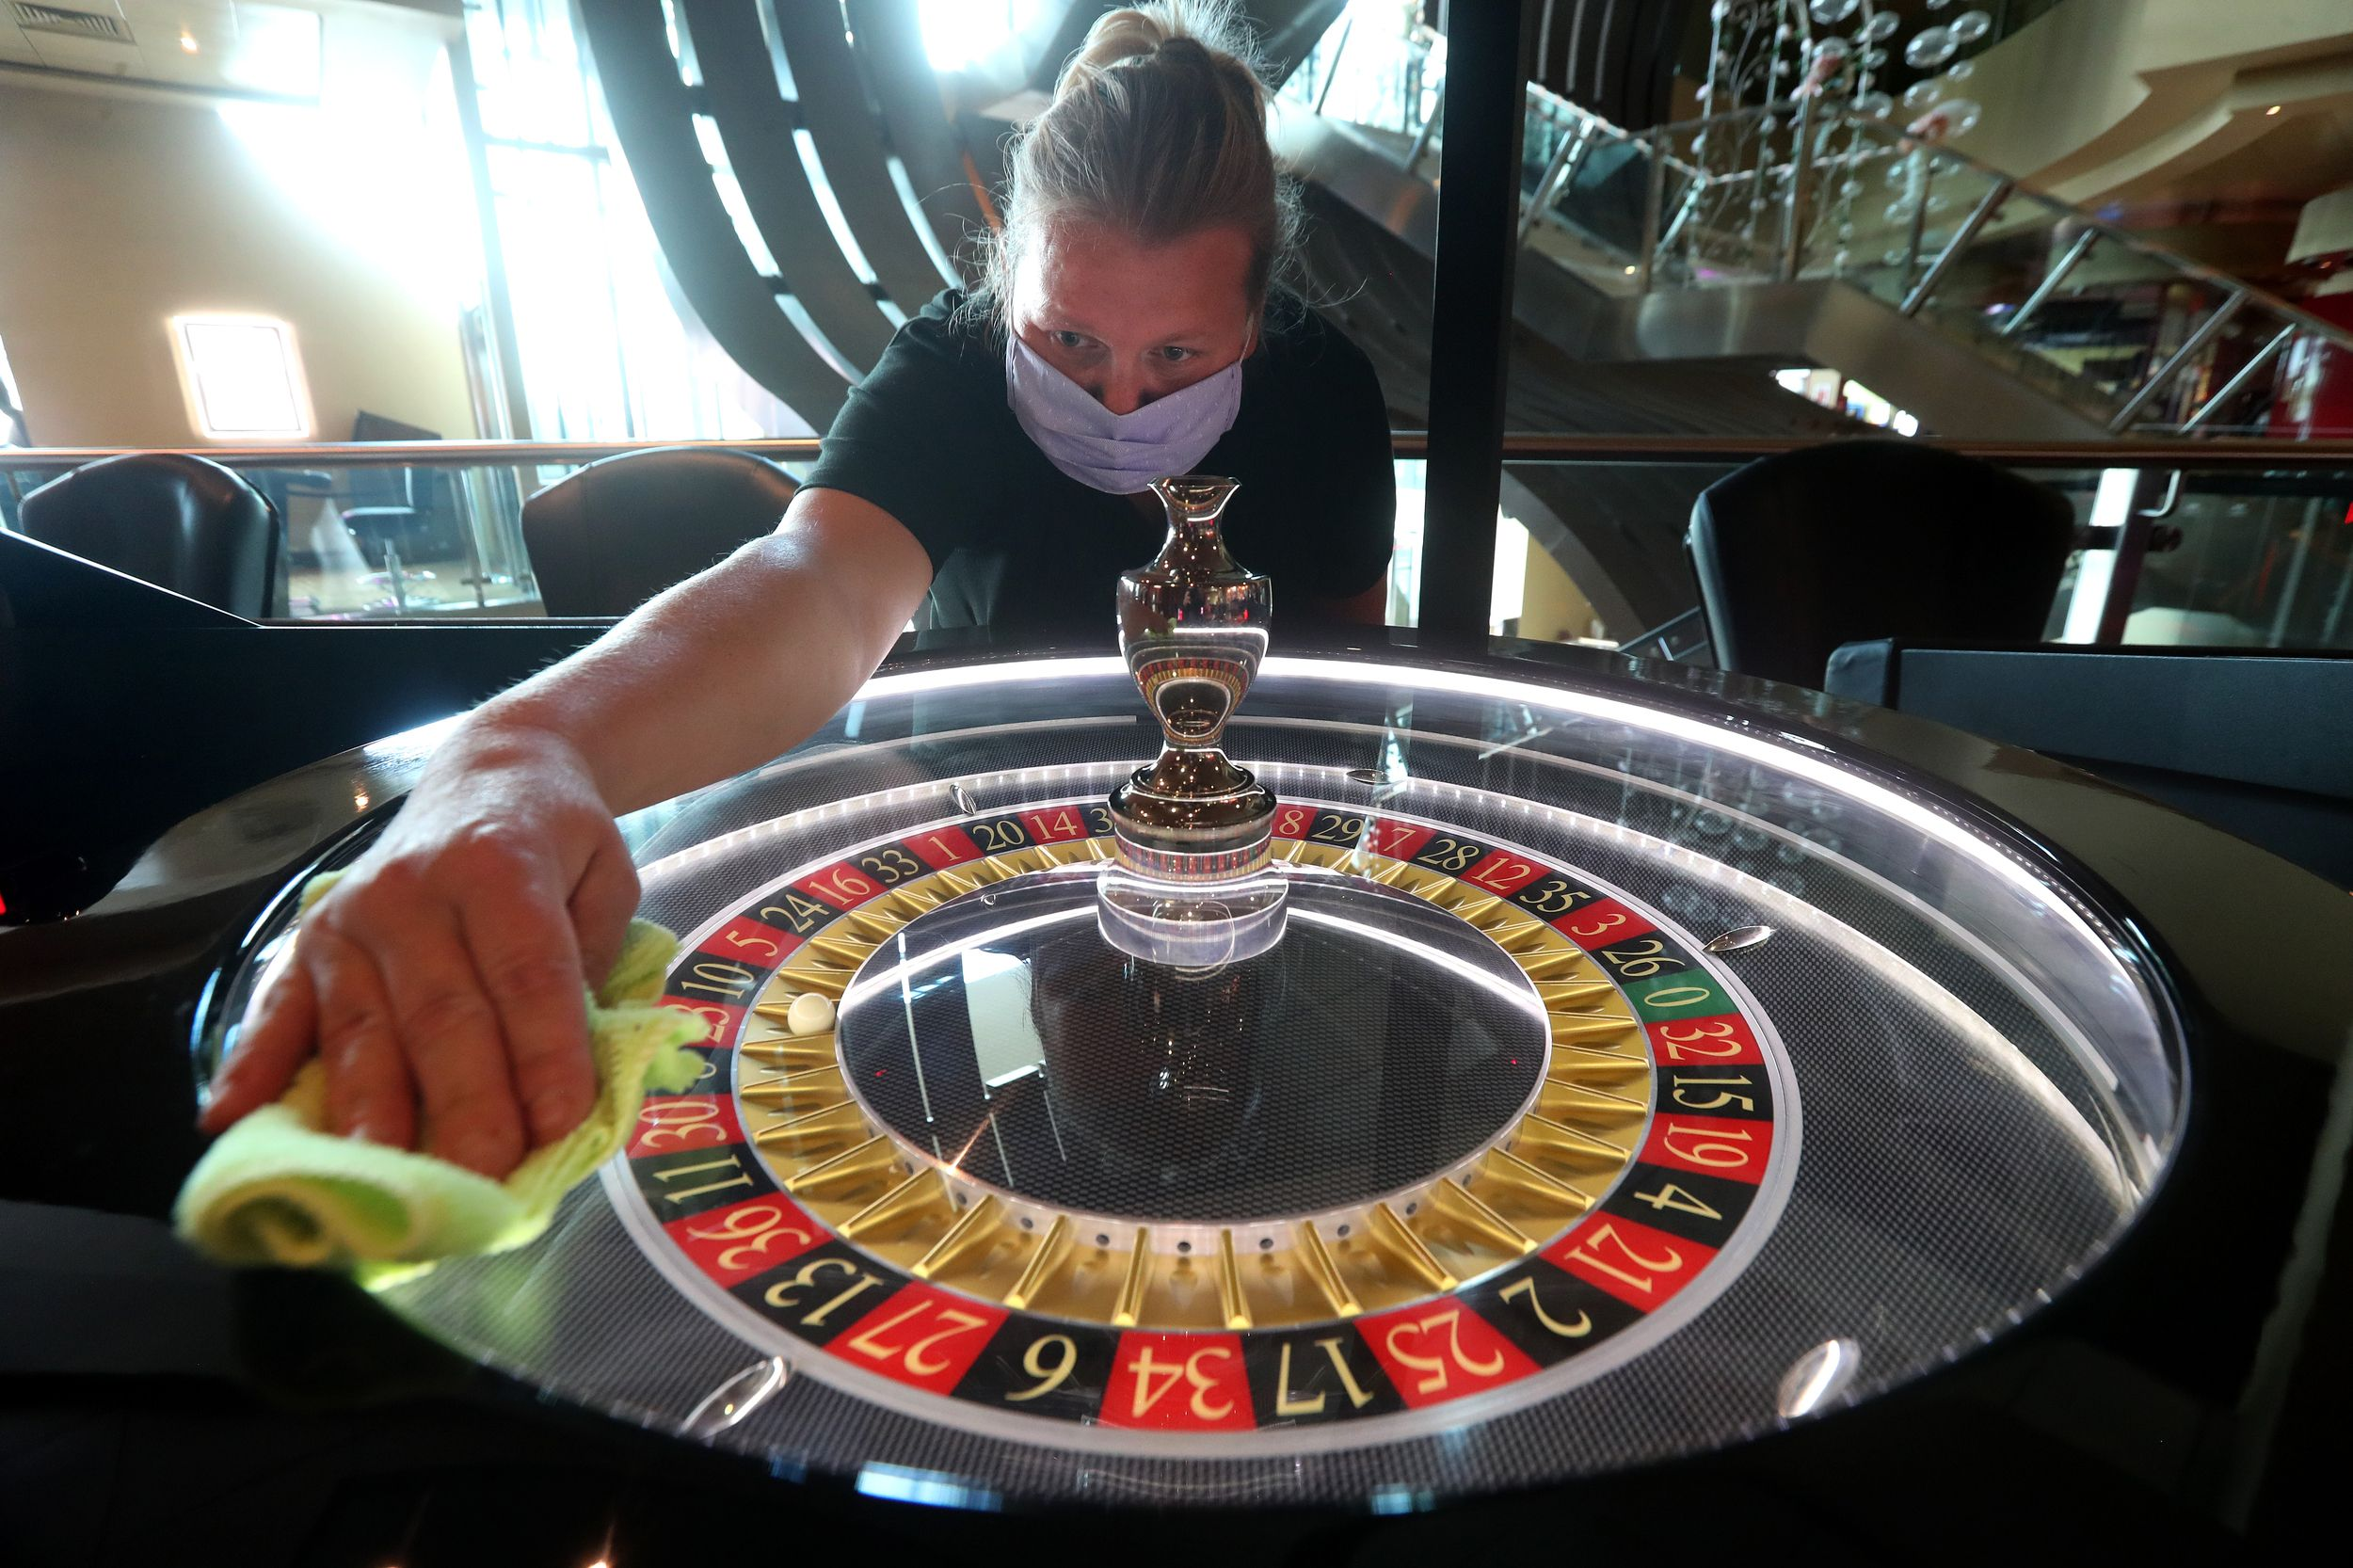 Monika Bednarska cleans the electronic roulette table